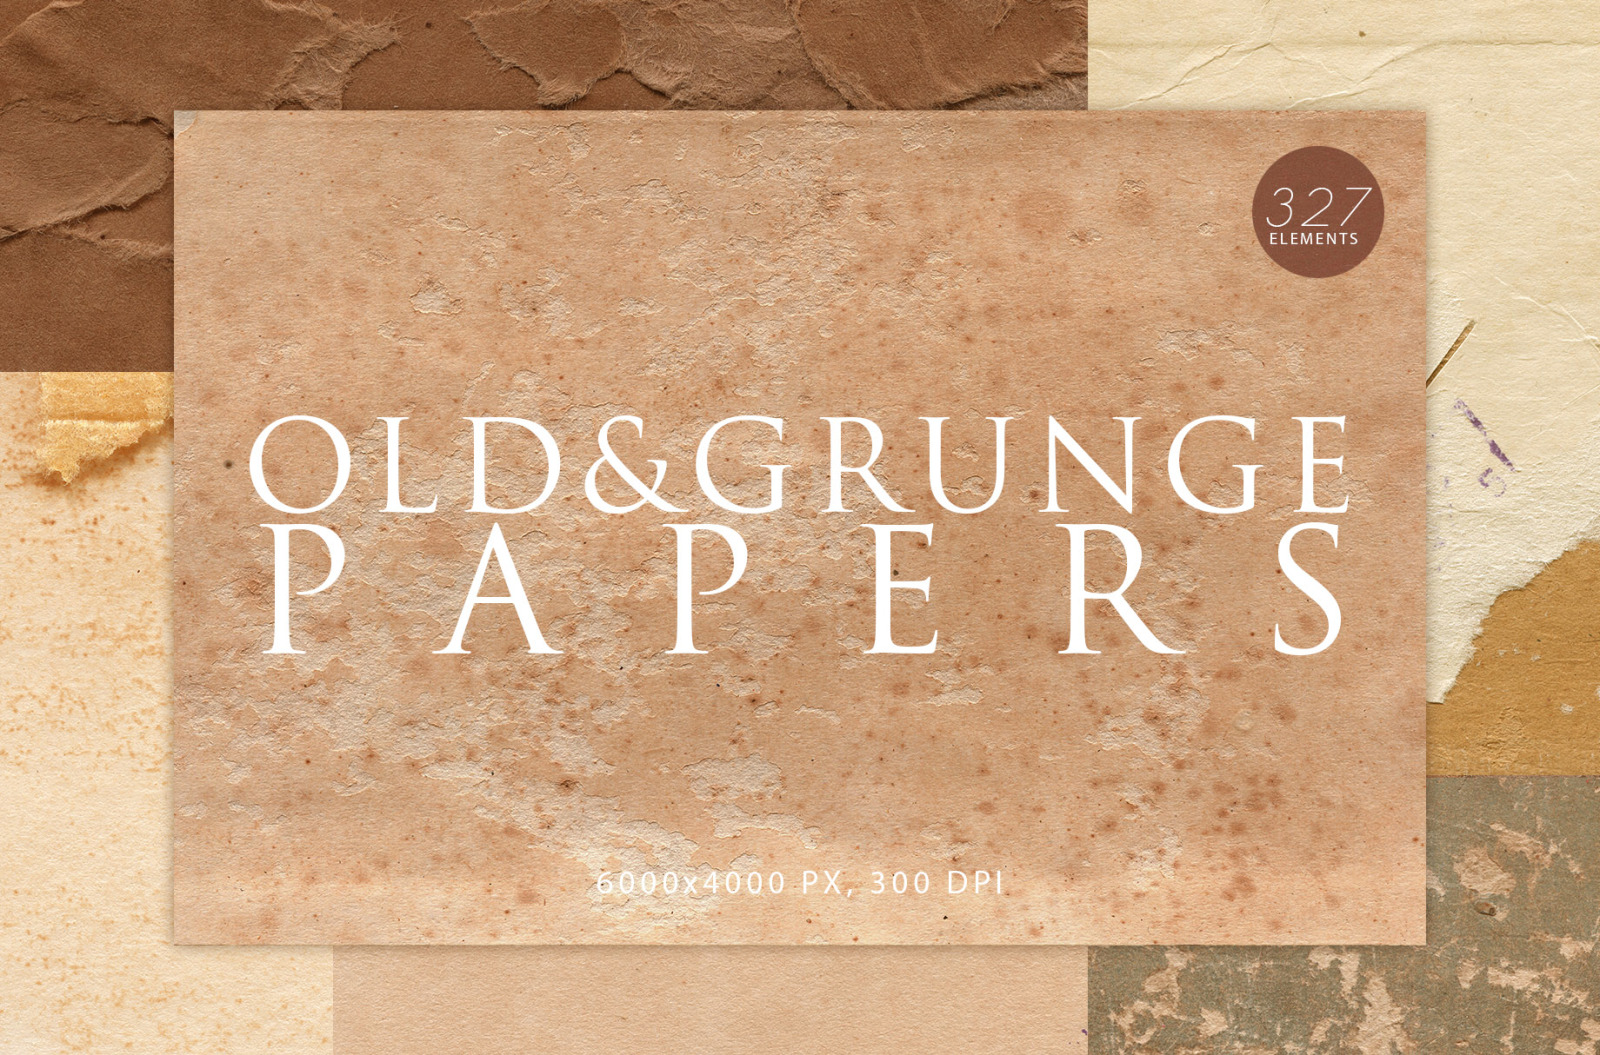 327 Old & Grunge Paper Textures